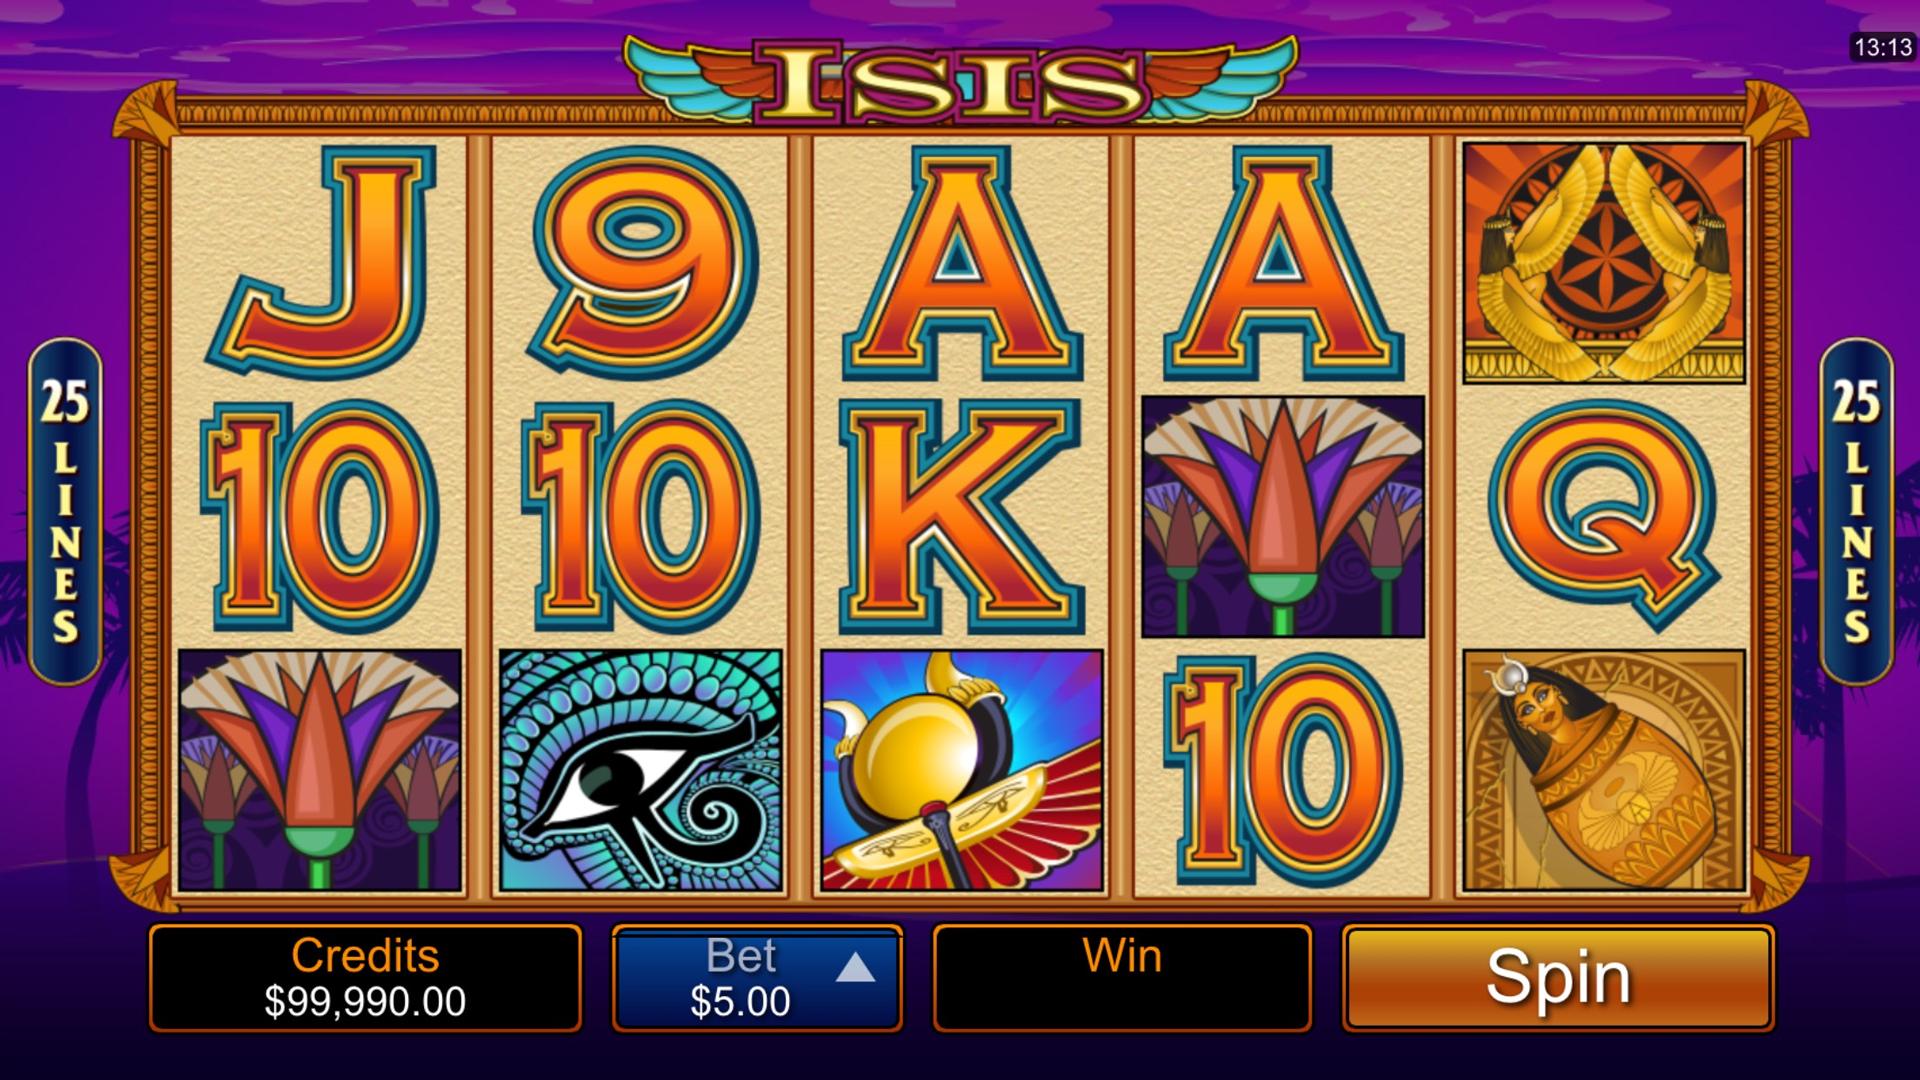 Casino juegos de Microgaming bally slot machines 466673